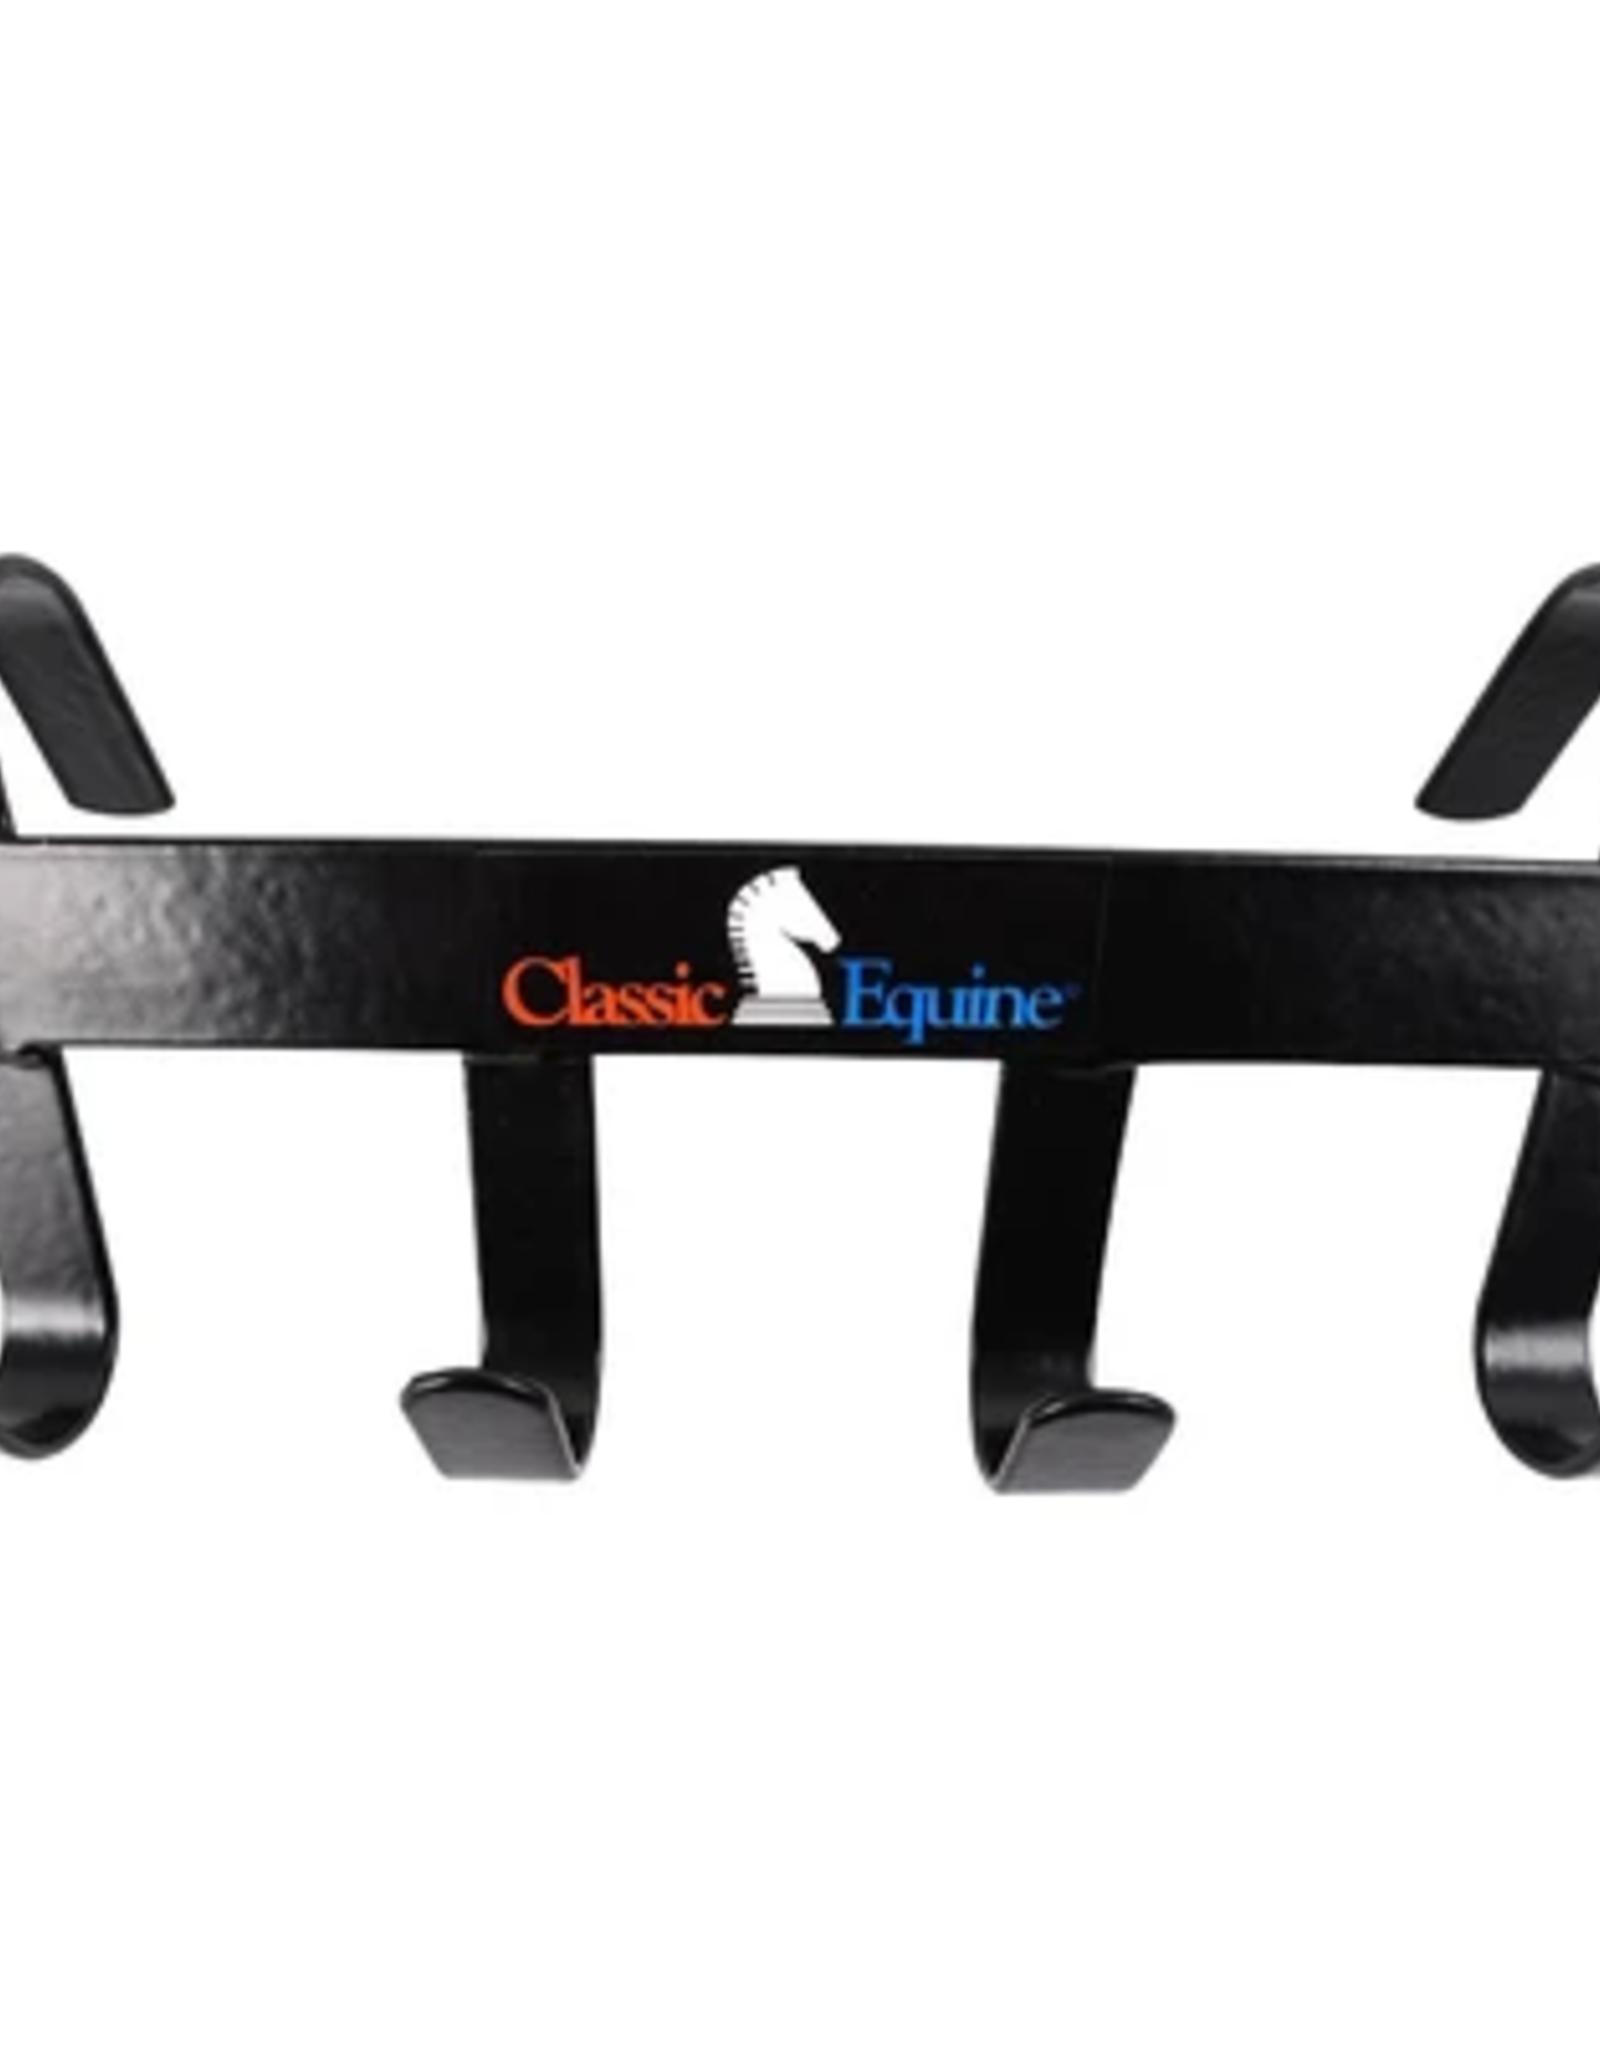 CLASSIC EQUINE 4 HOOK BRIDLE HANGER